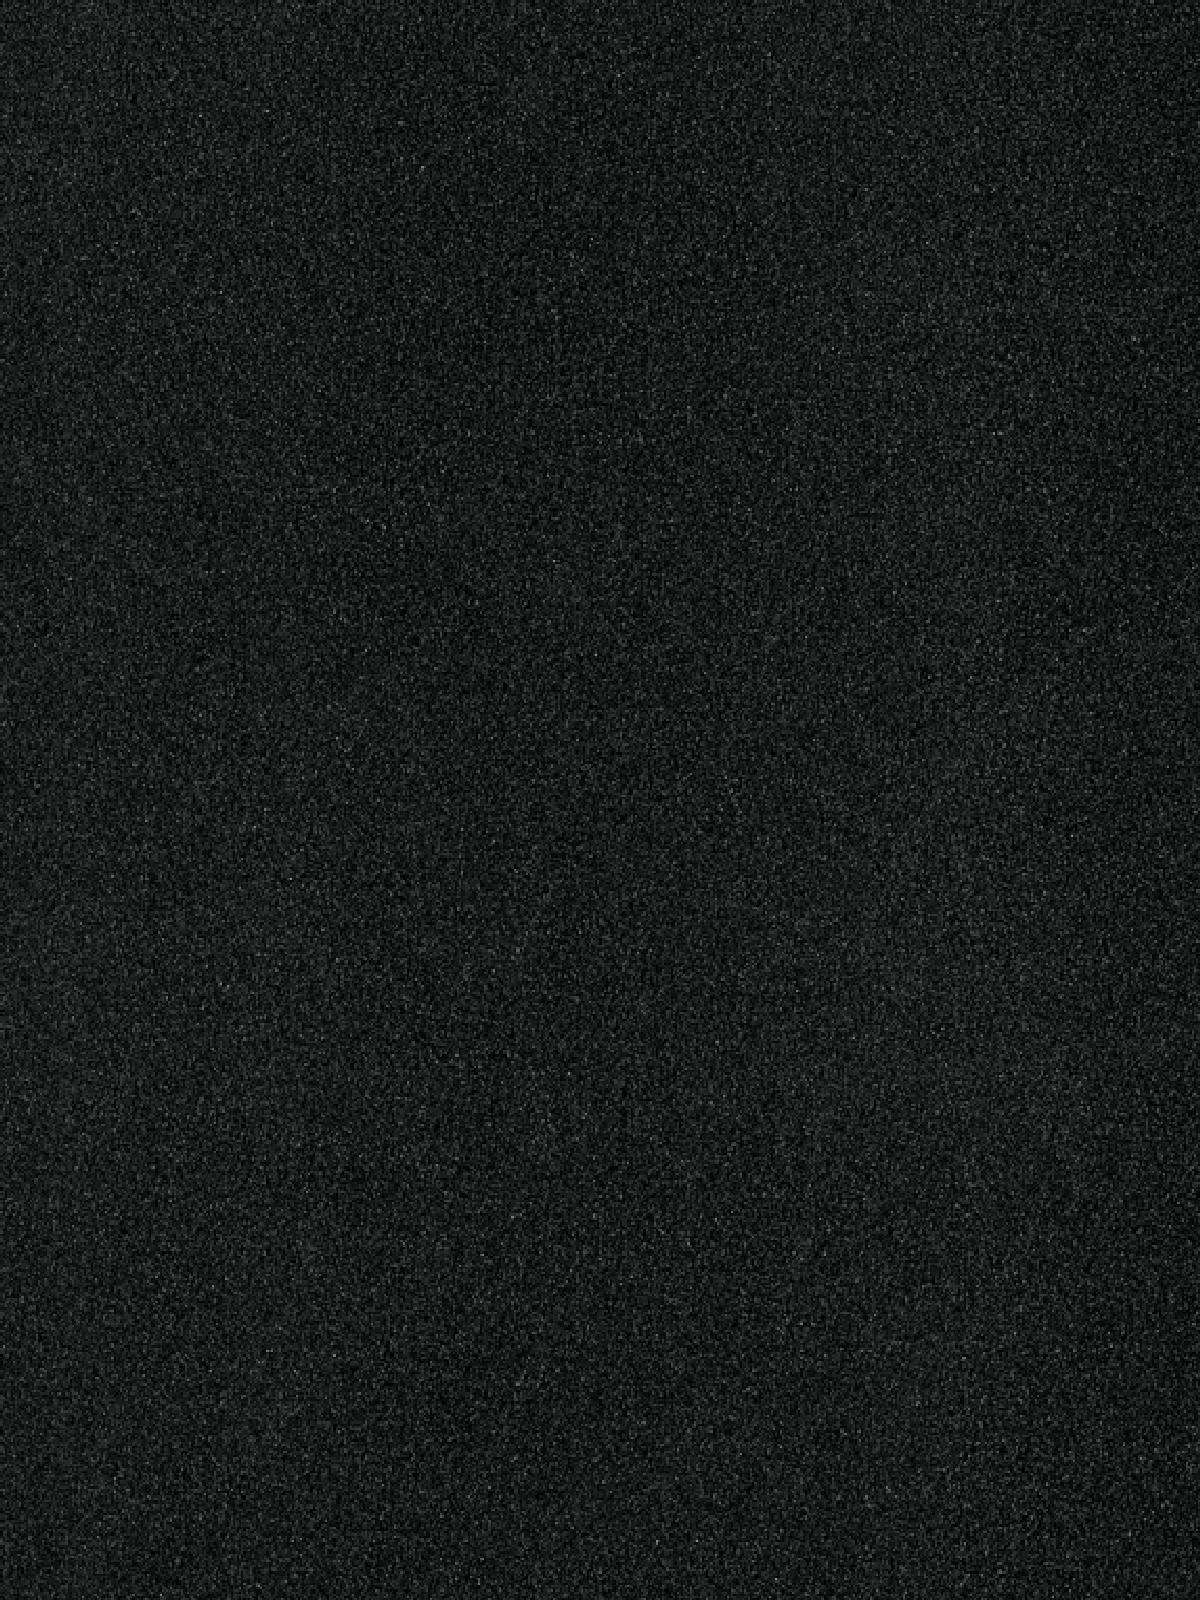 50+ Black Sparkle Wallpaper on WallpaperSafari